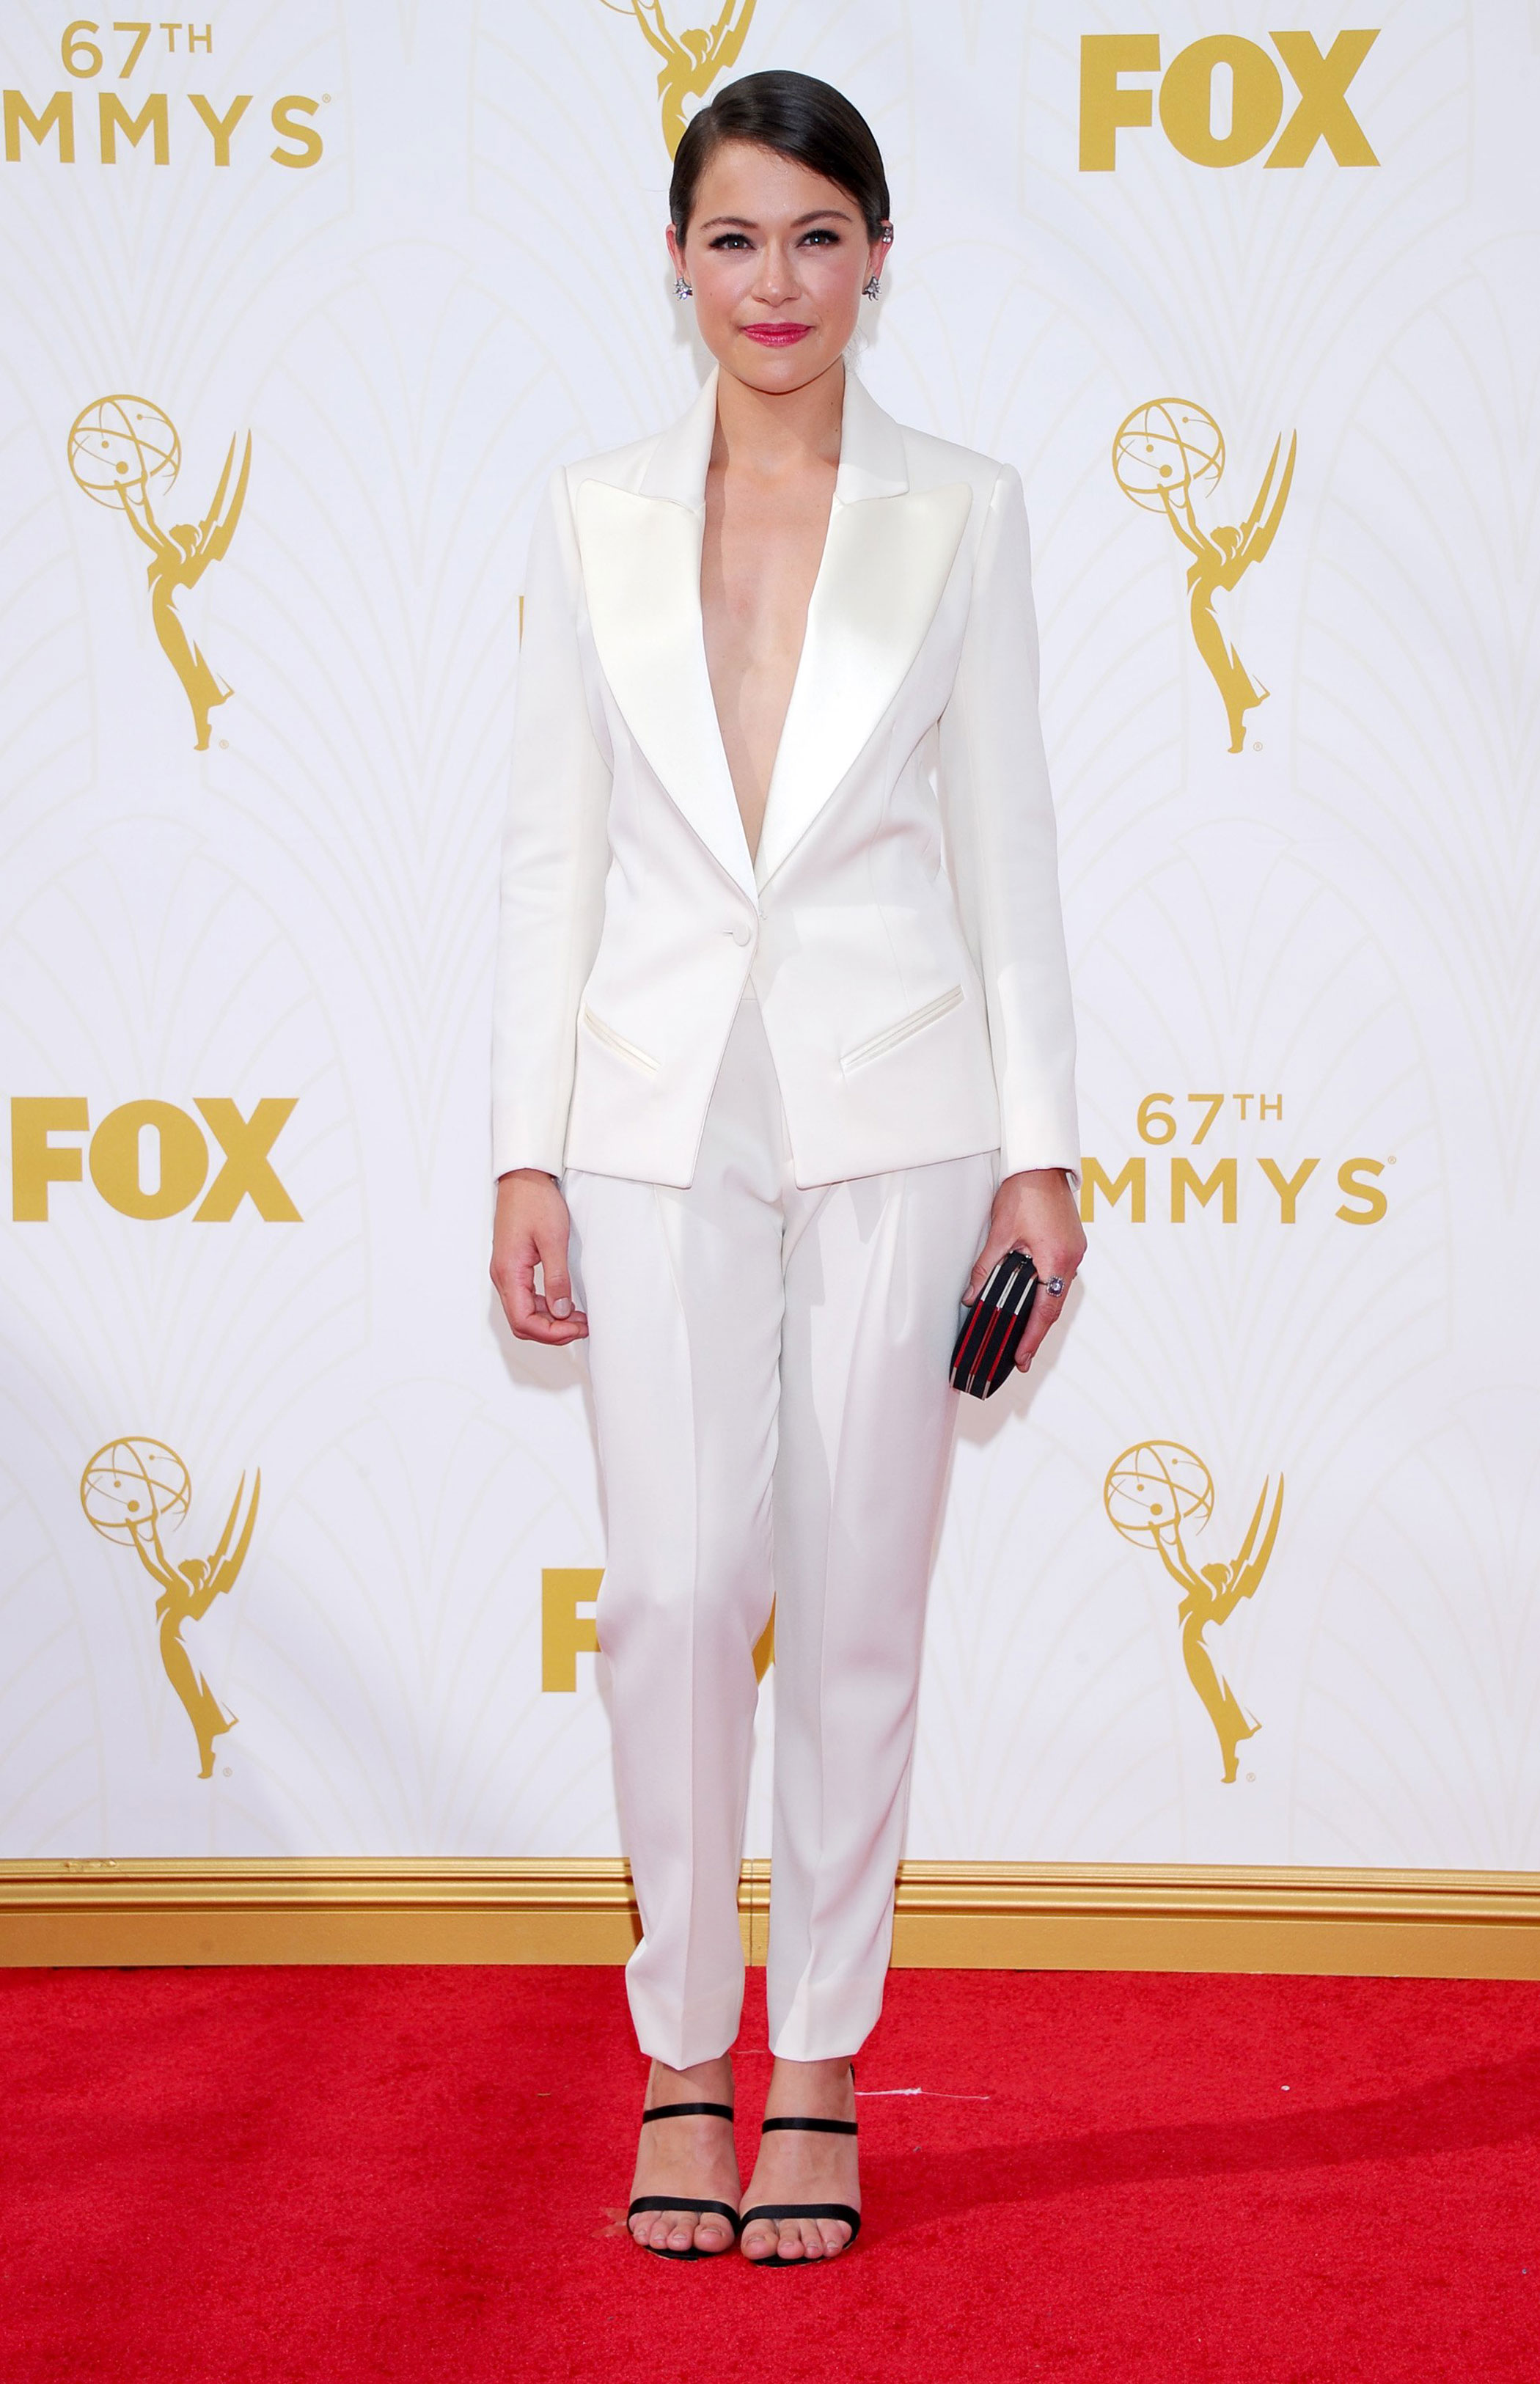 Tatiana Maslany at the 67th Emmy Award on Sept. 20, 2015 in Los Angeles.